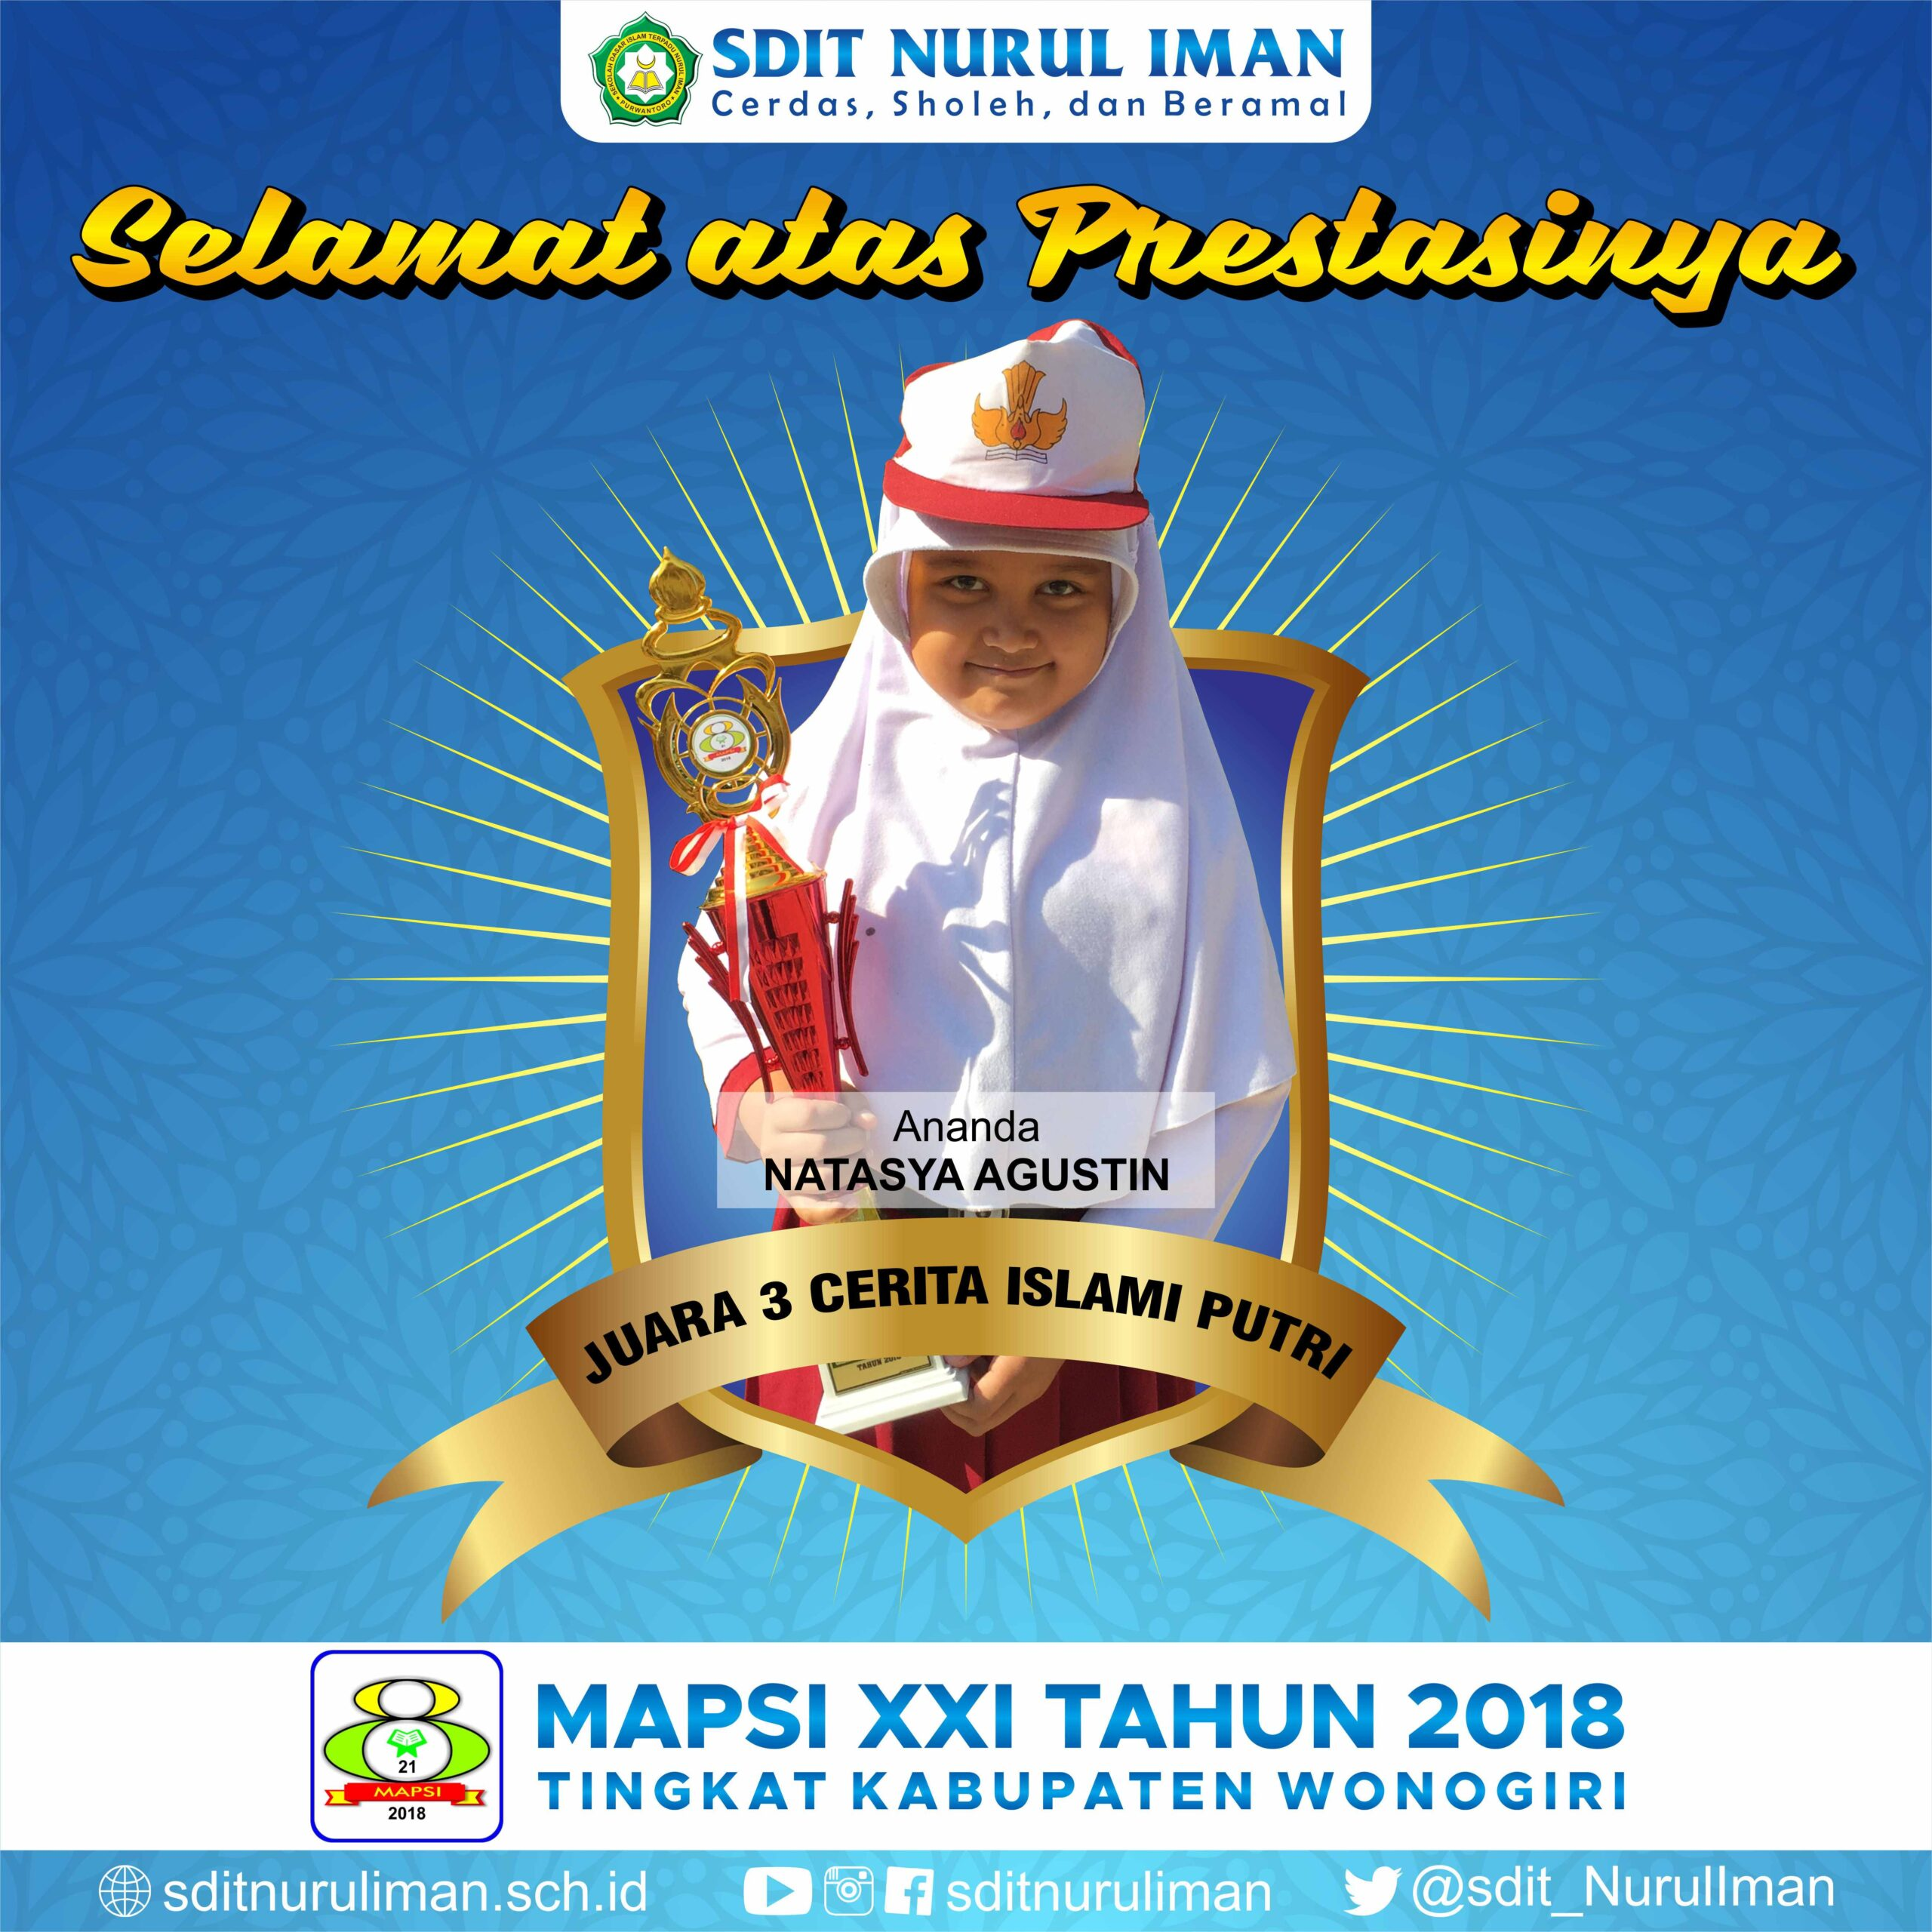 Juara 3 Cerita Islami Putri Lomba MAPSI XXI Tingkat Kabupaten Wonogiri